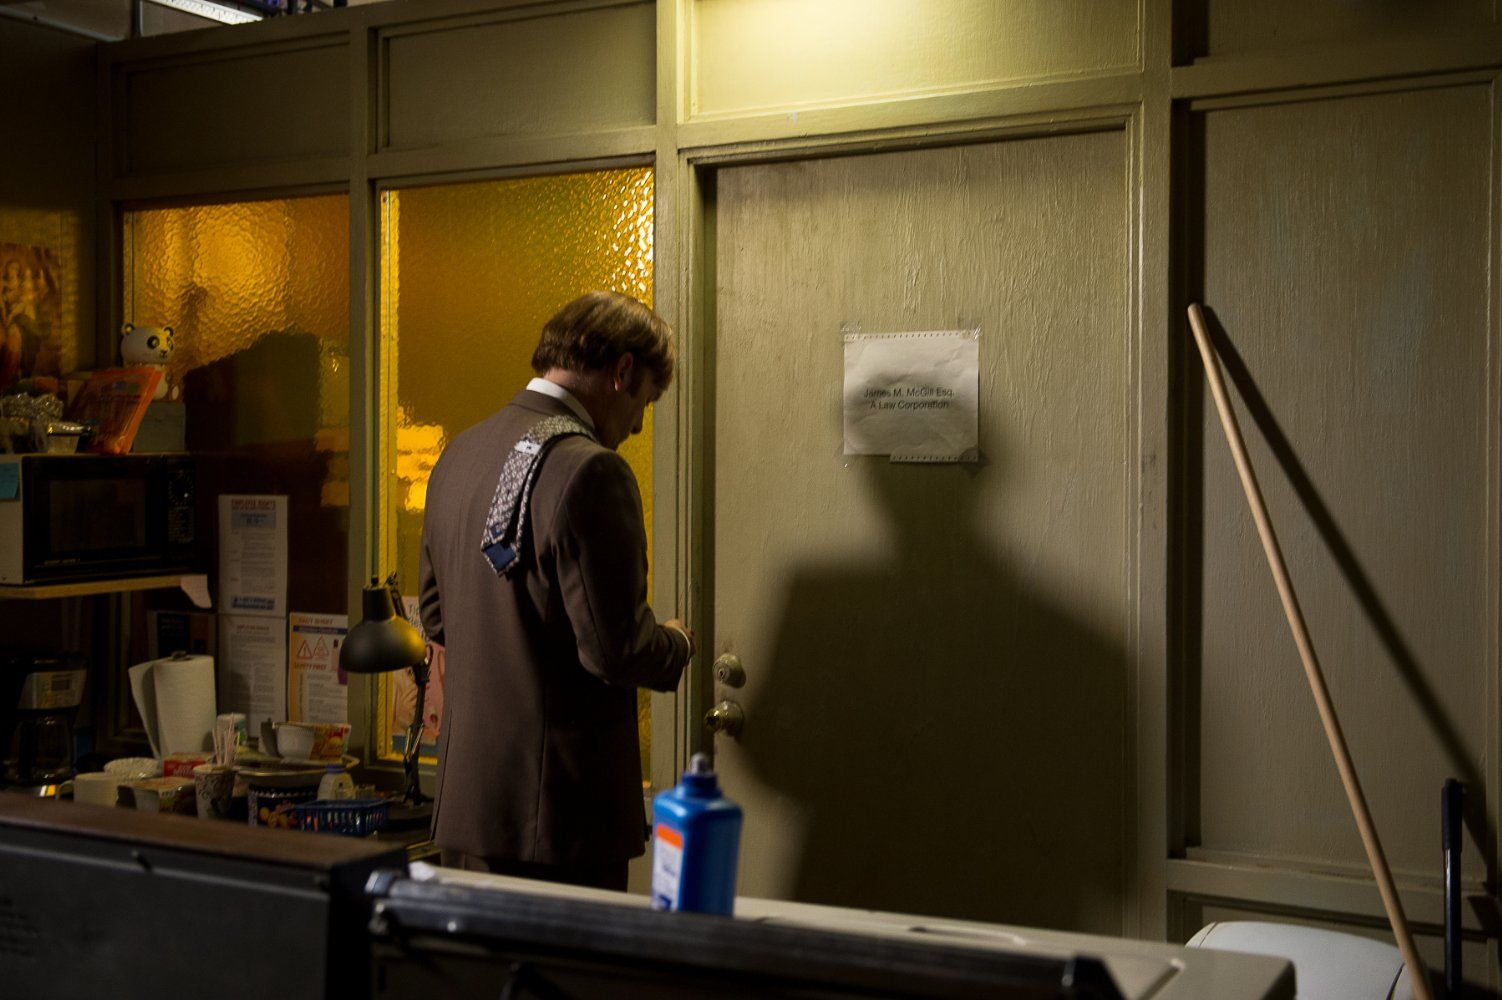 """Better Call Saul"" Switch (TV Episode 2016) - Photo Gallery - IMDb"